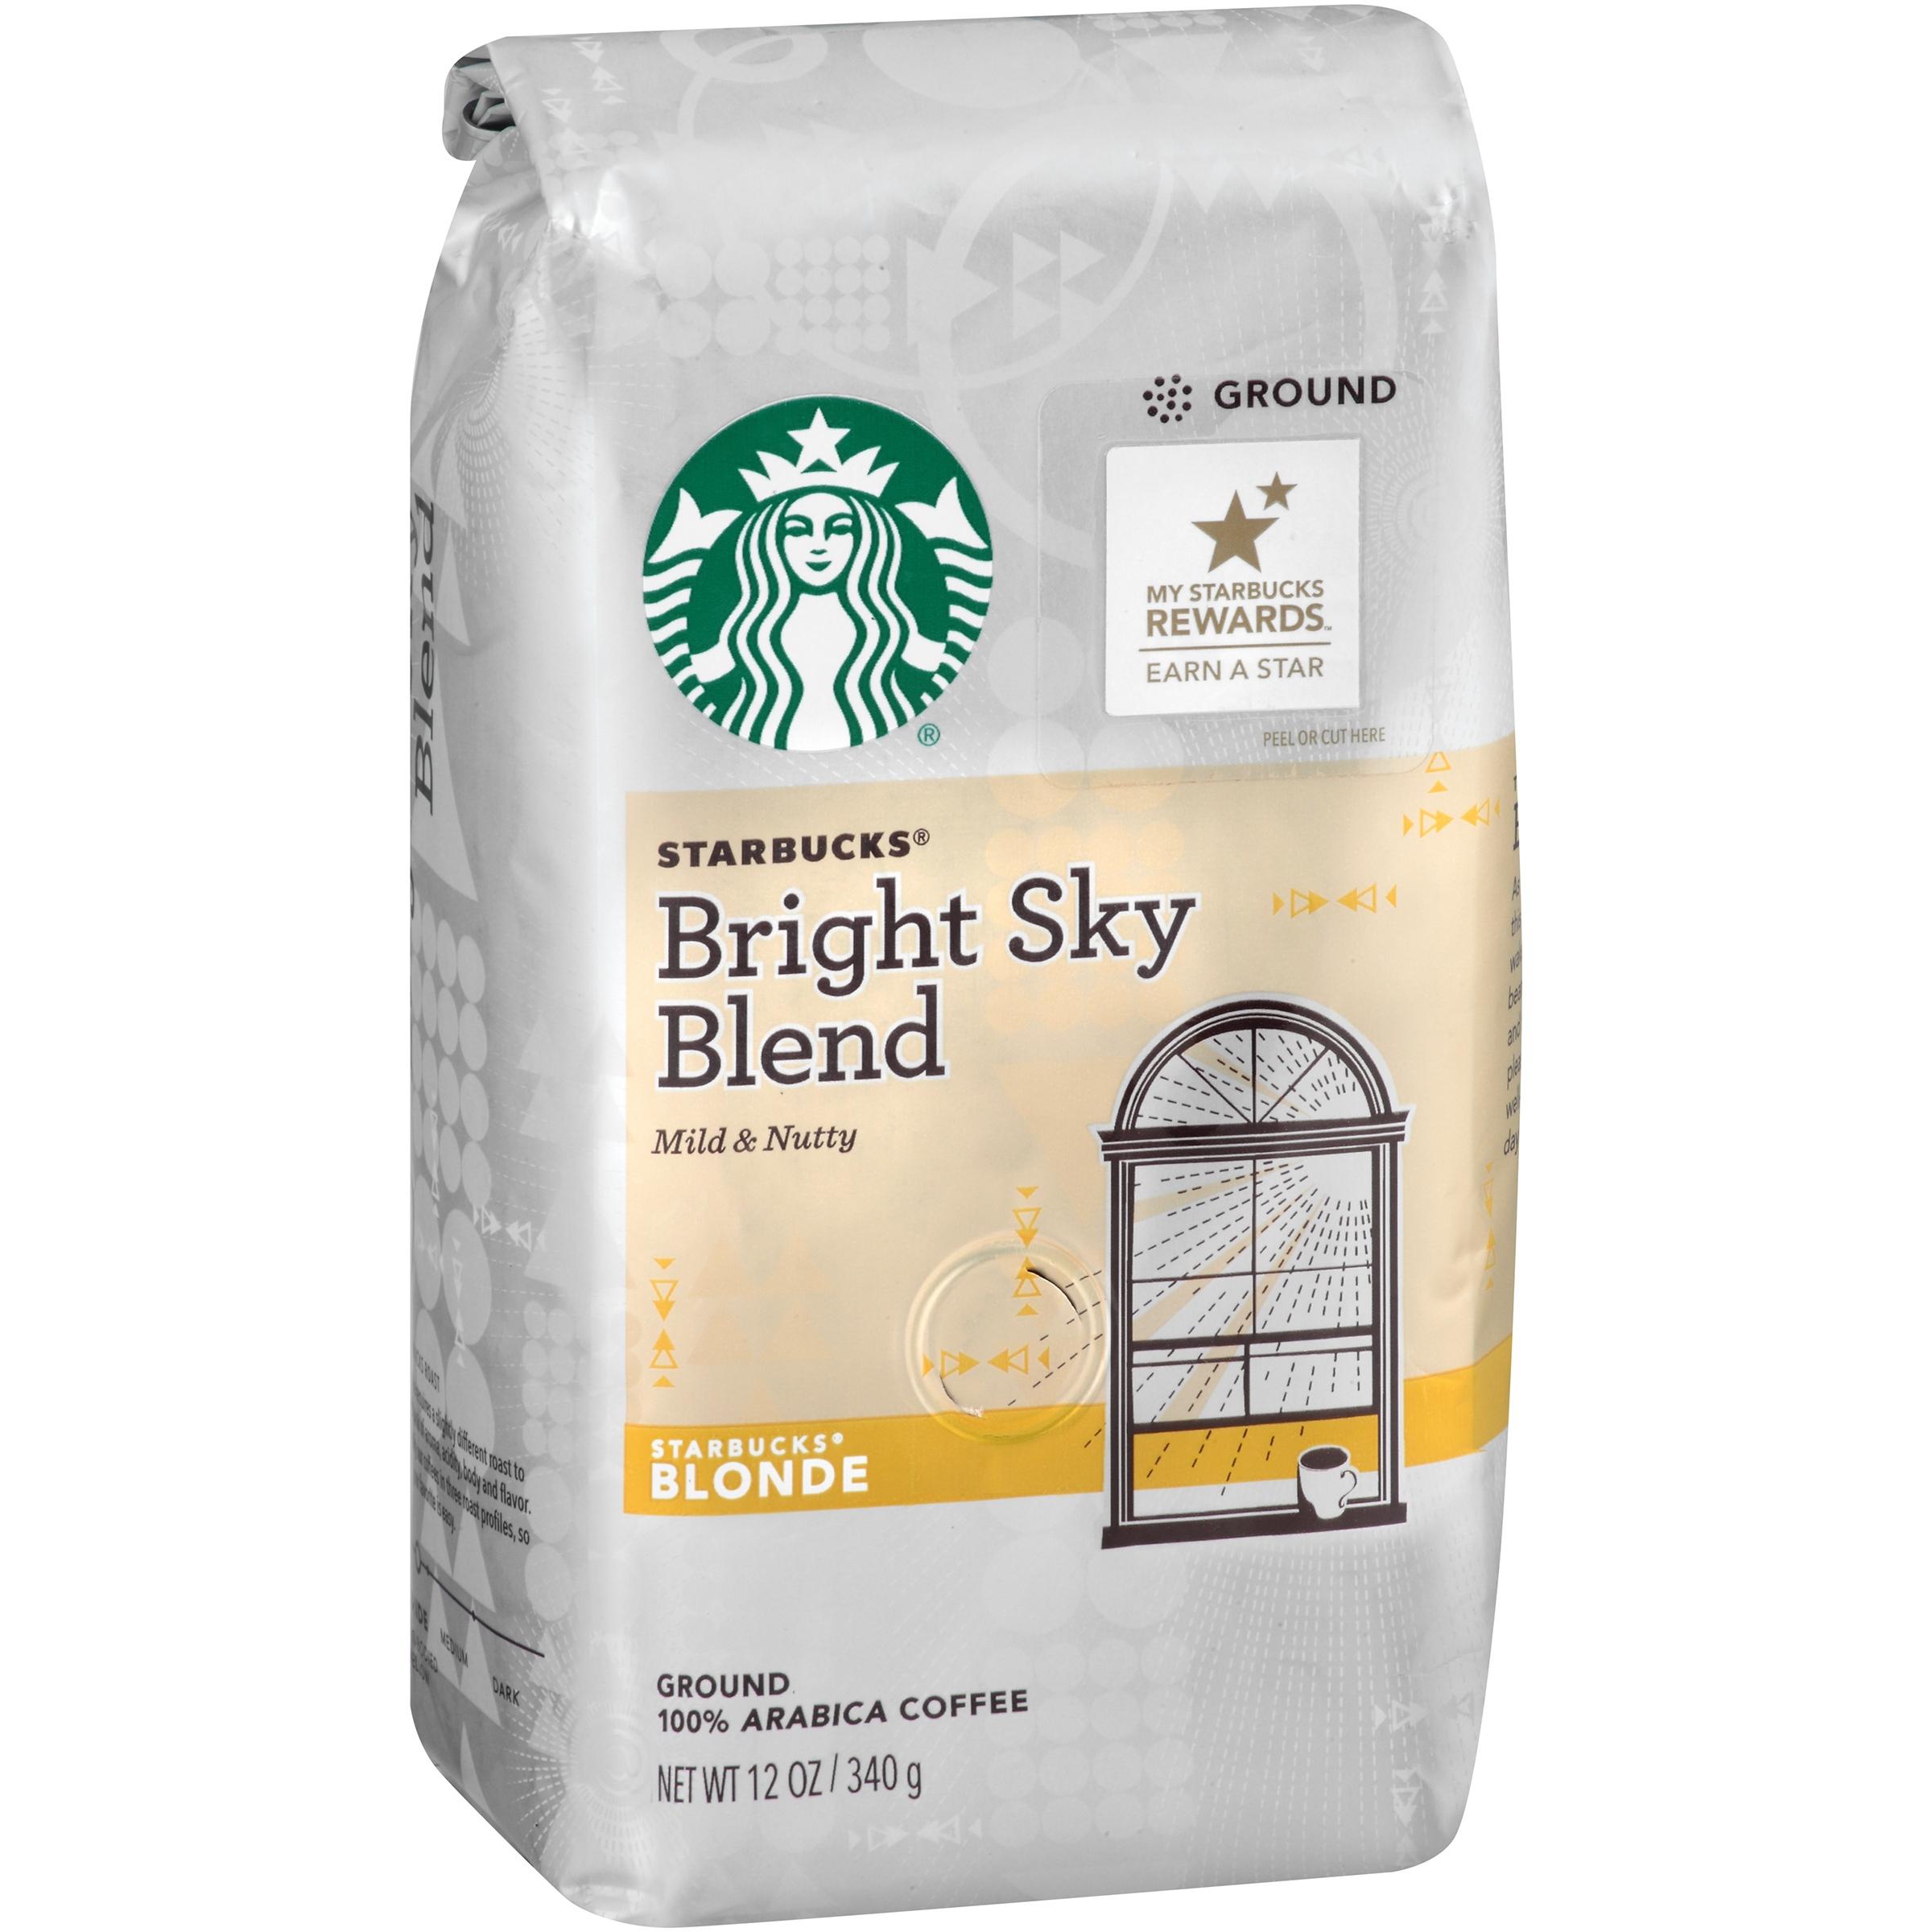 Starbucks® Bright Sky Blend Blonde Roast Ground Coffee 12 oz. Bag